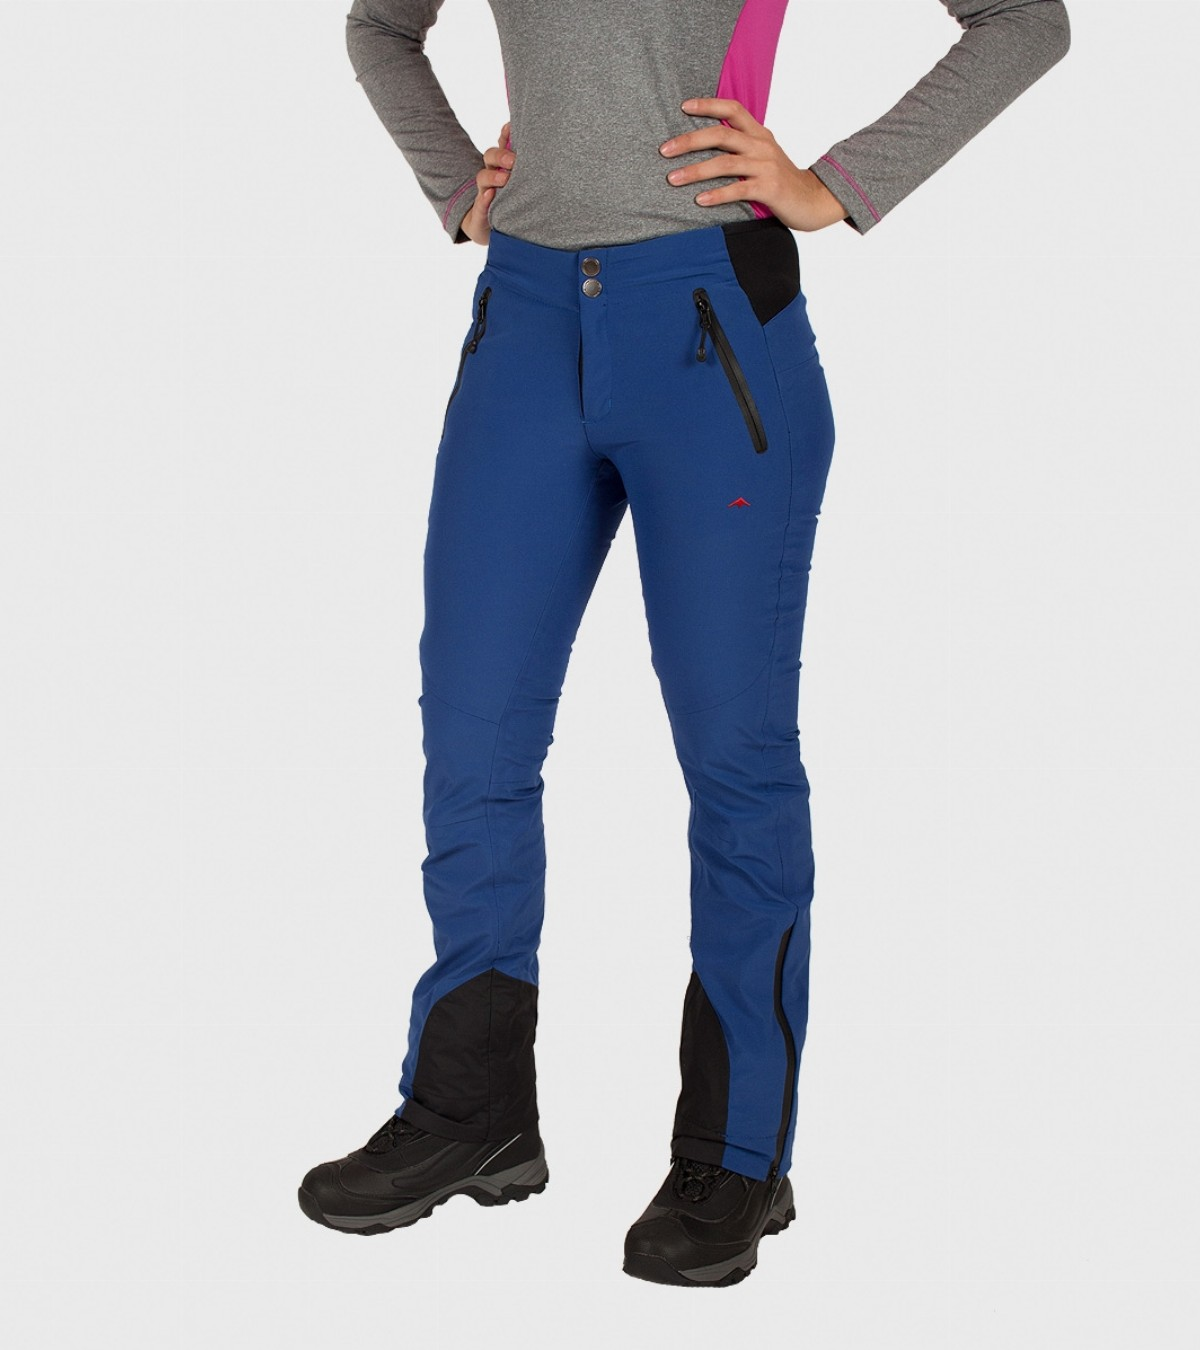 Pantalón de ski de mujer Scarlet